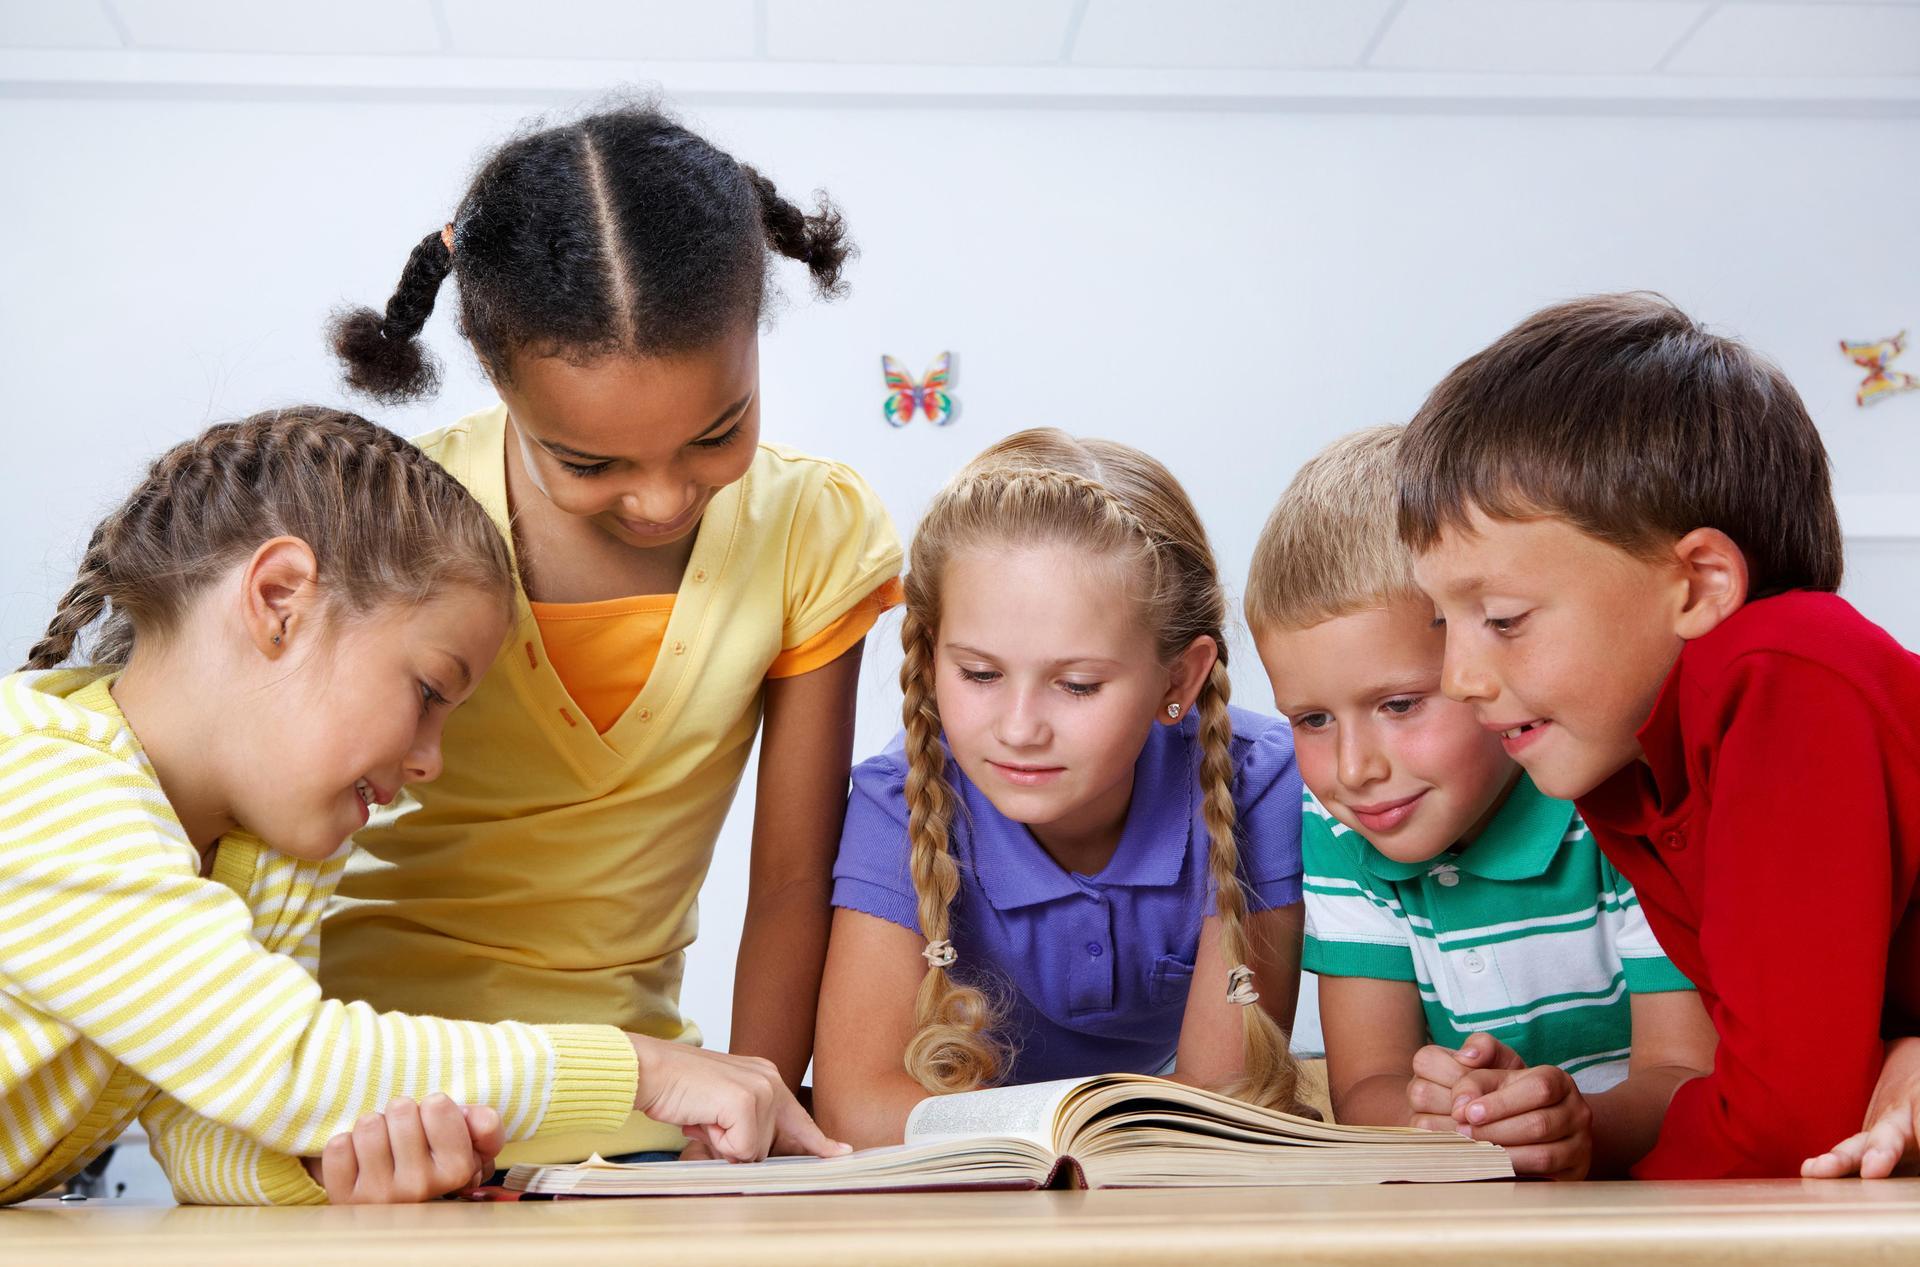 Stock photo - children reading